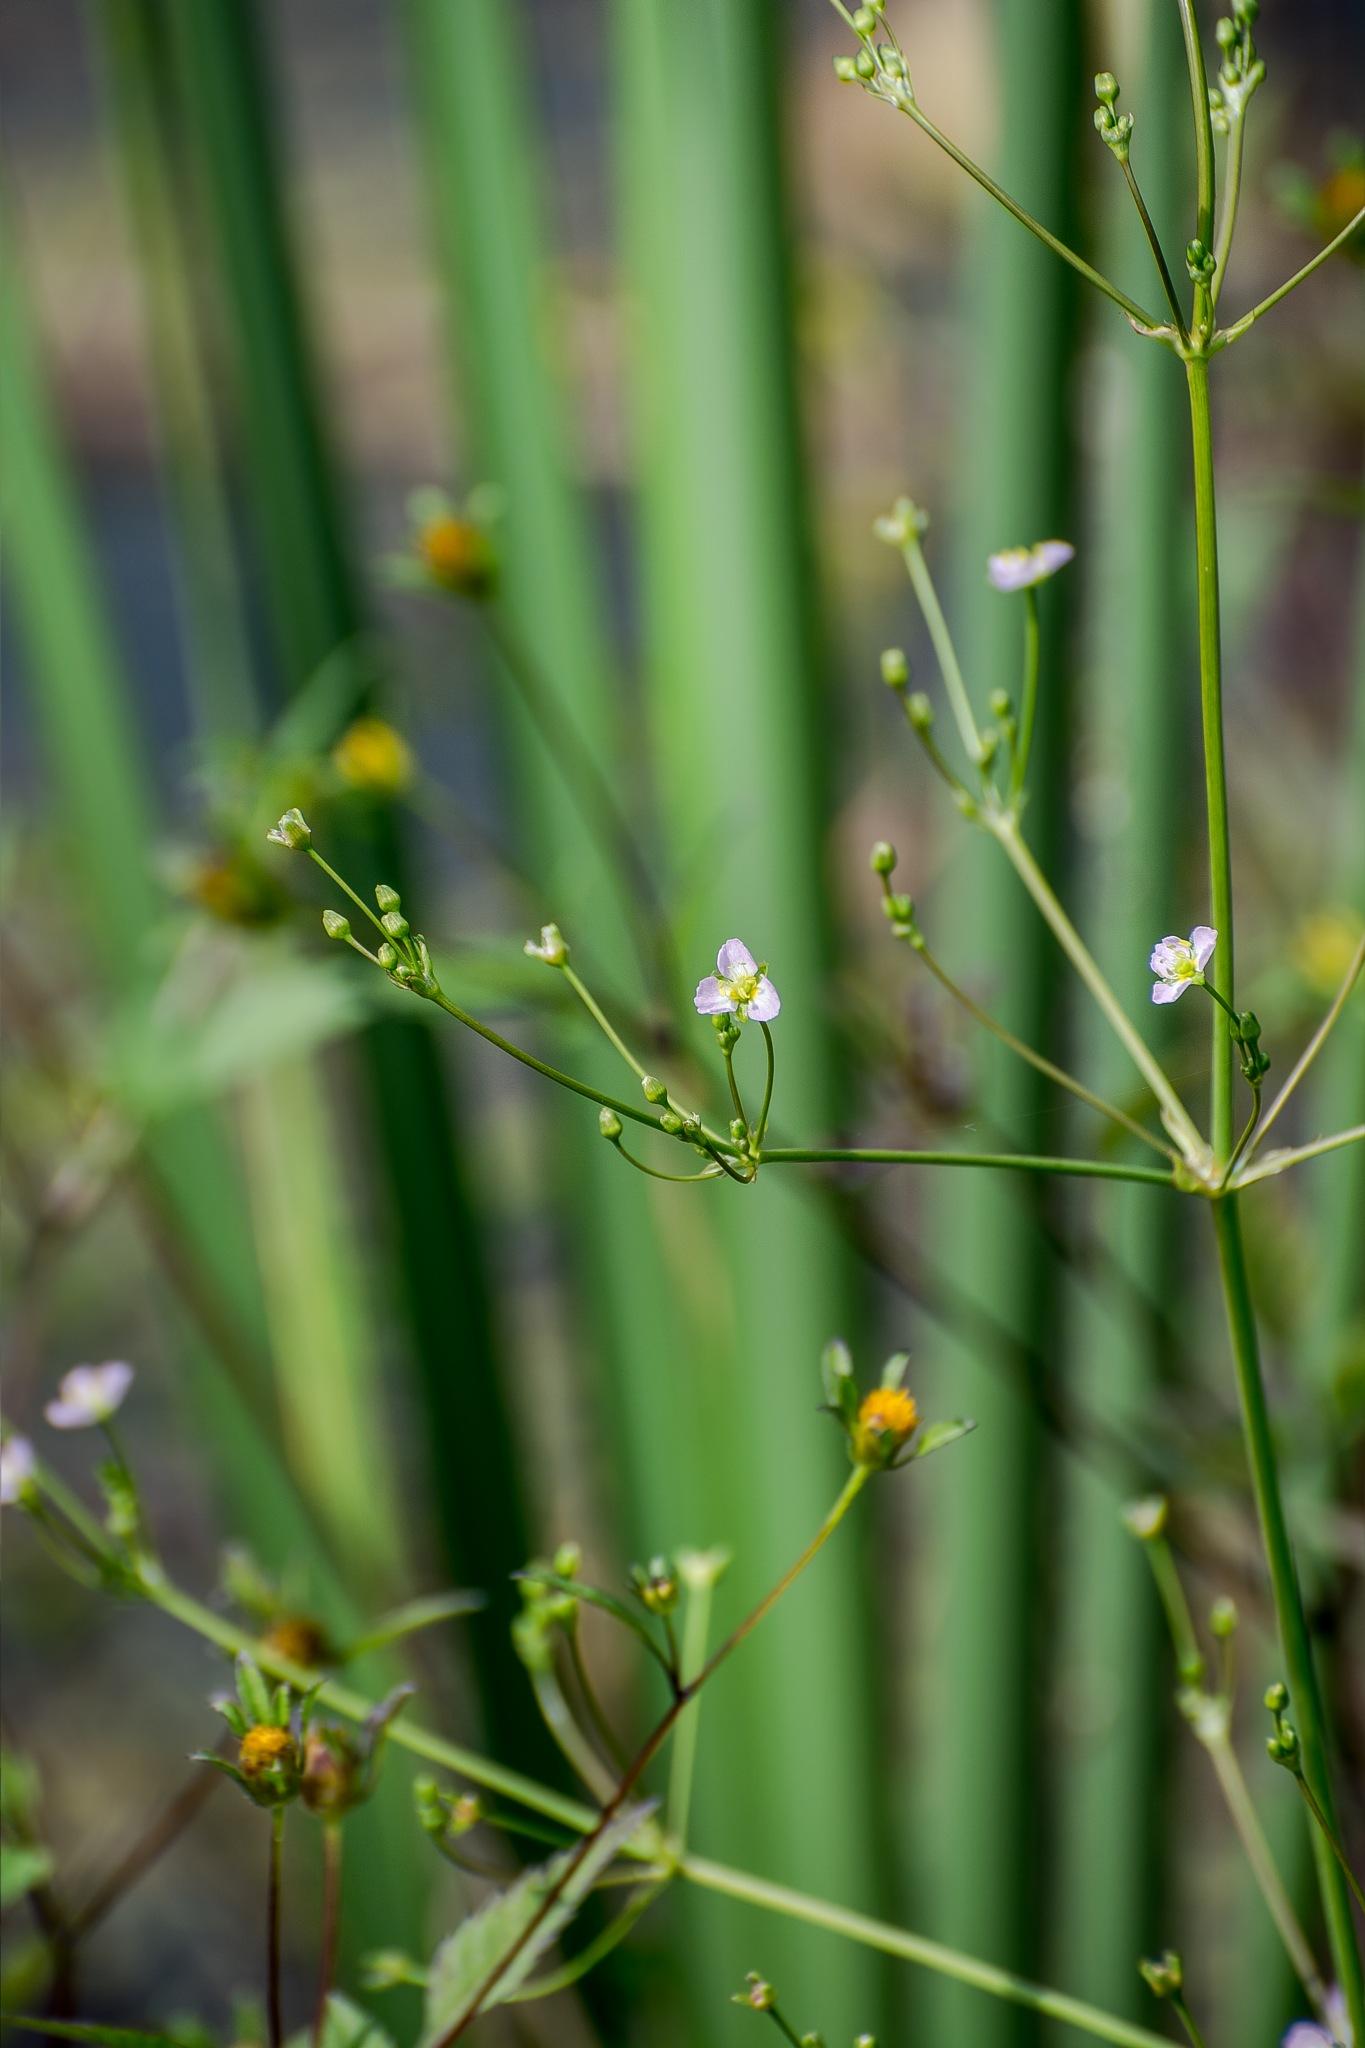 European water-plantain / Alisma plantago-aquatica by stoplamek